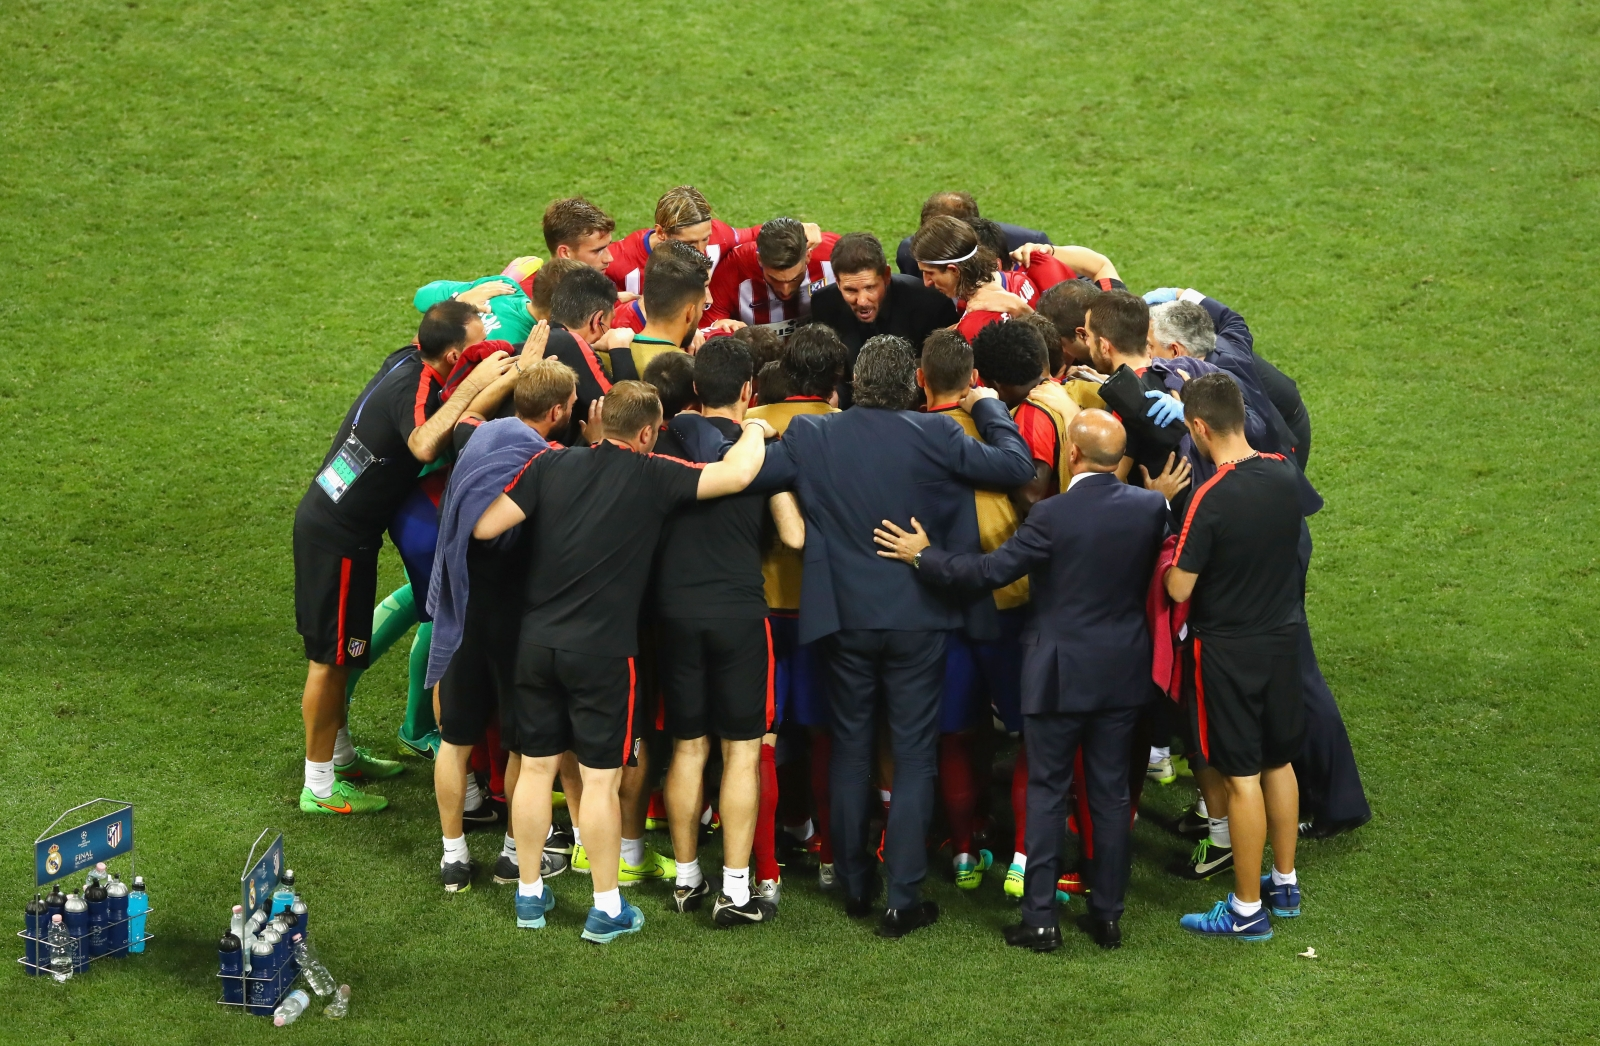 Atletico have a team huddle